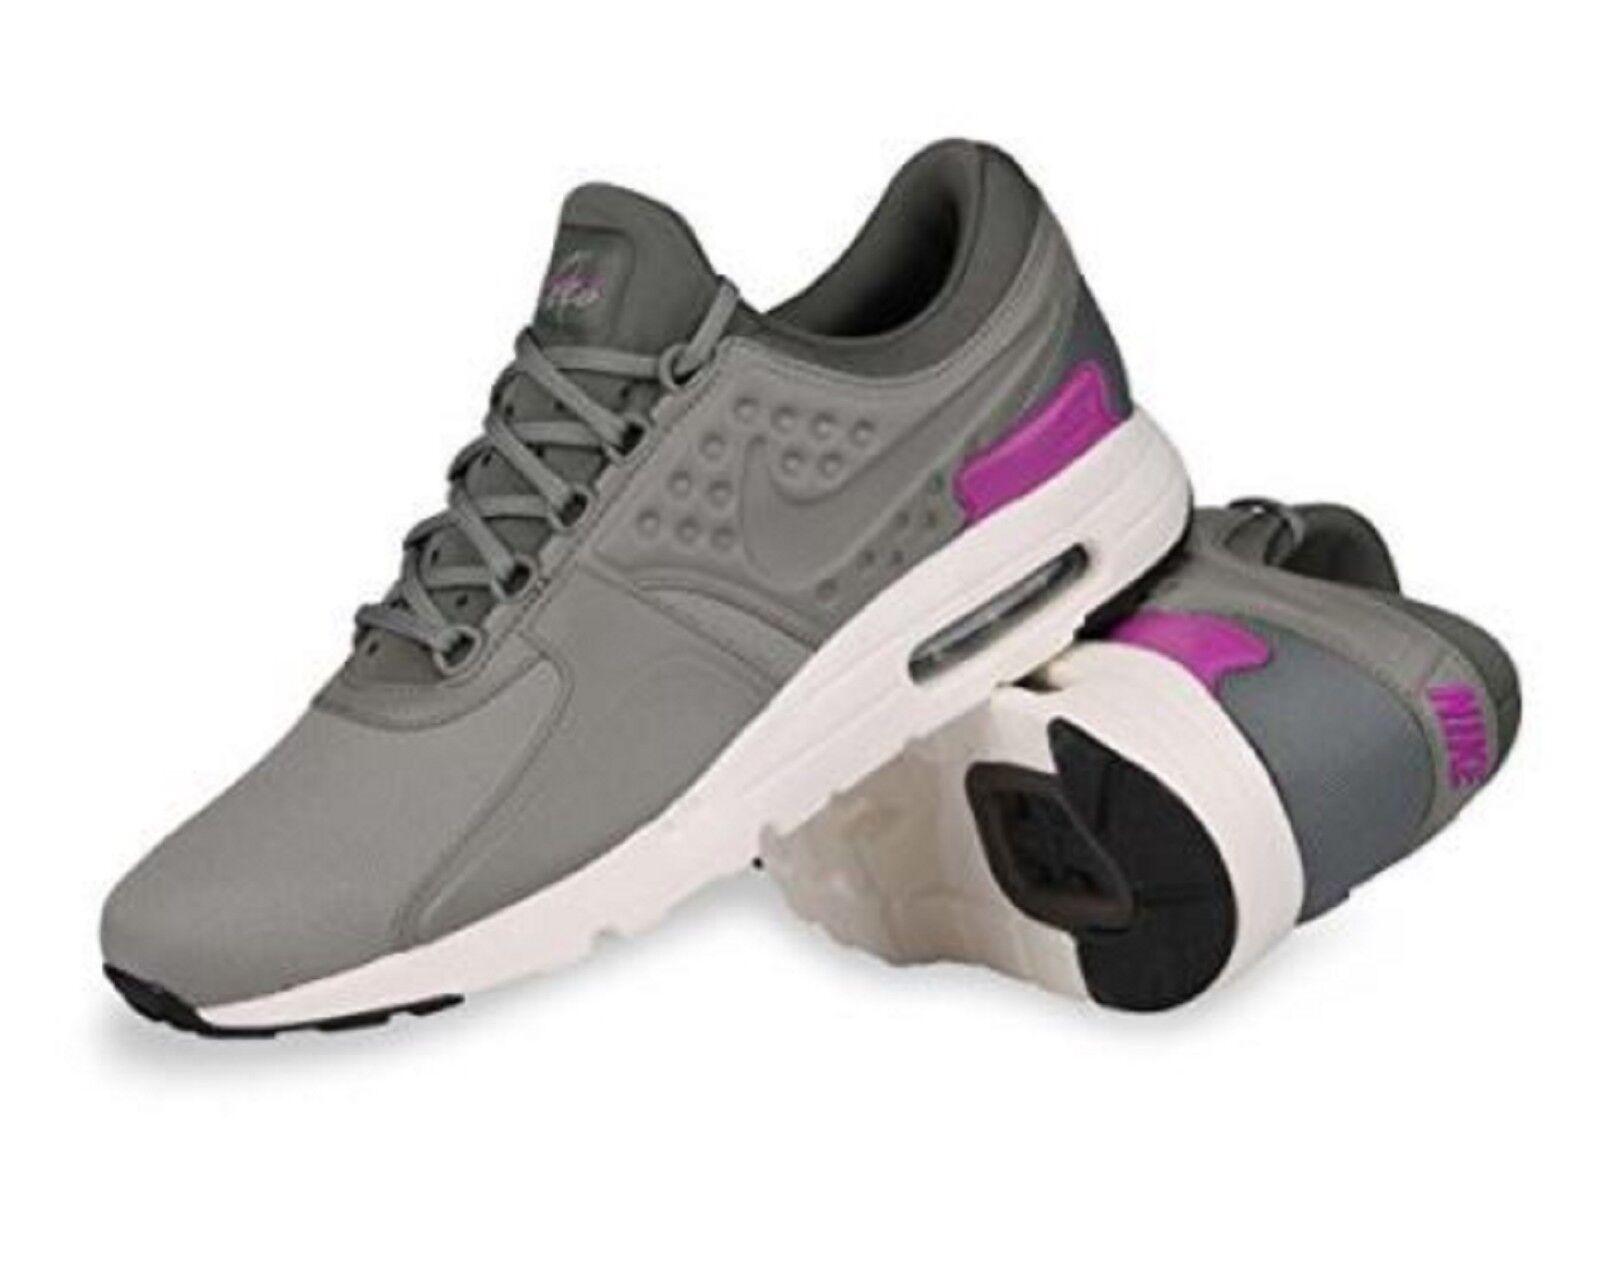 Nike NEW Mens Air Max Zero Premium Running Shoes 881982-004 Size 11 150